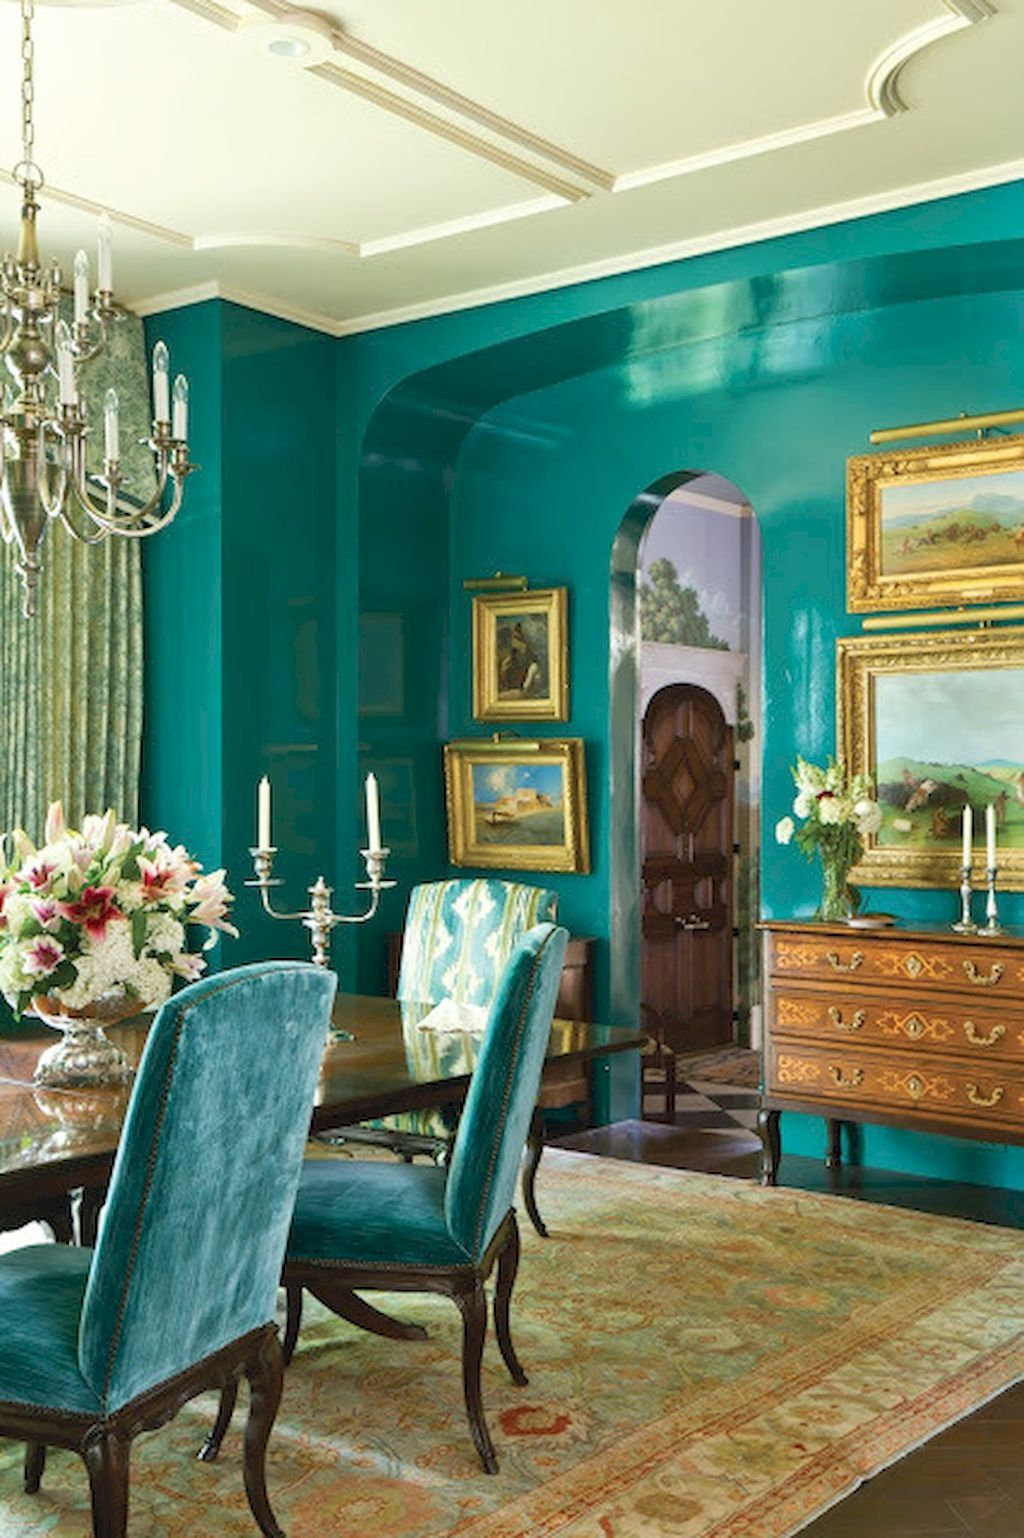 55 Vintage Victorian Dining Room Decor Ideas  Victorian Dining Interesting Victorian Dining Room Decor 2018